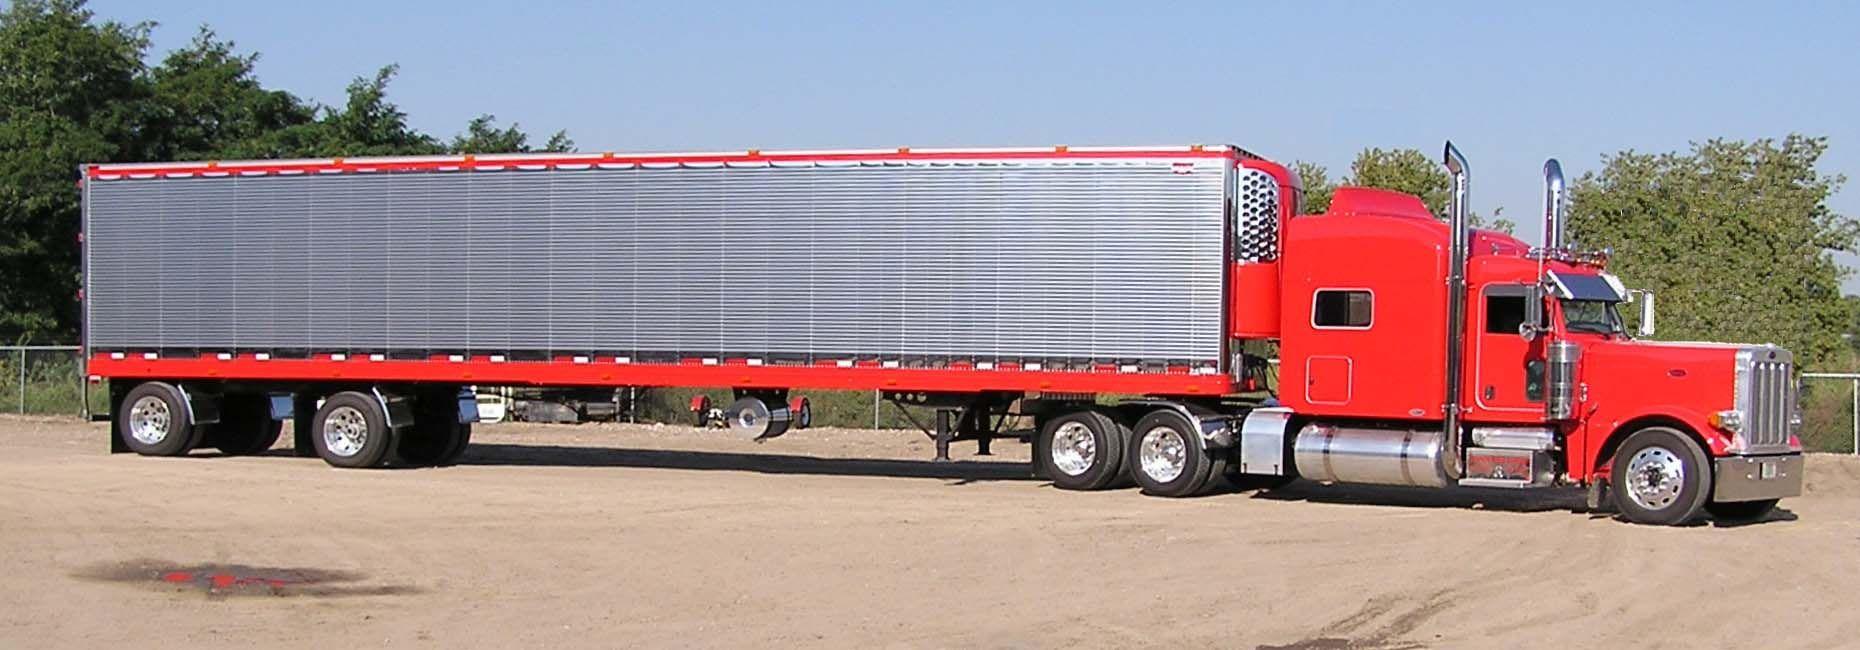 Galleries red peterbilt trucks html